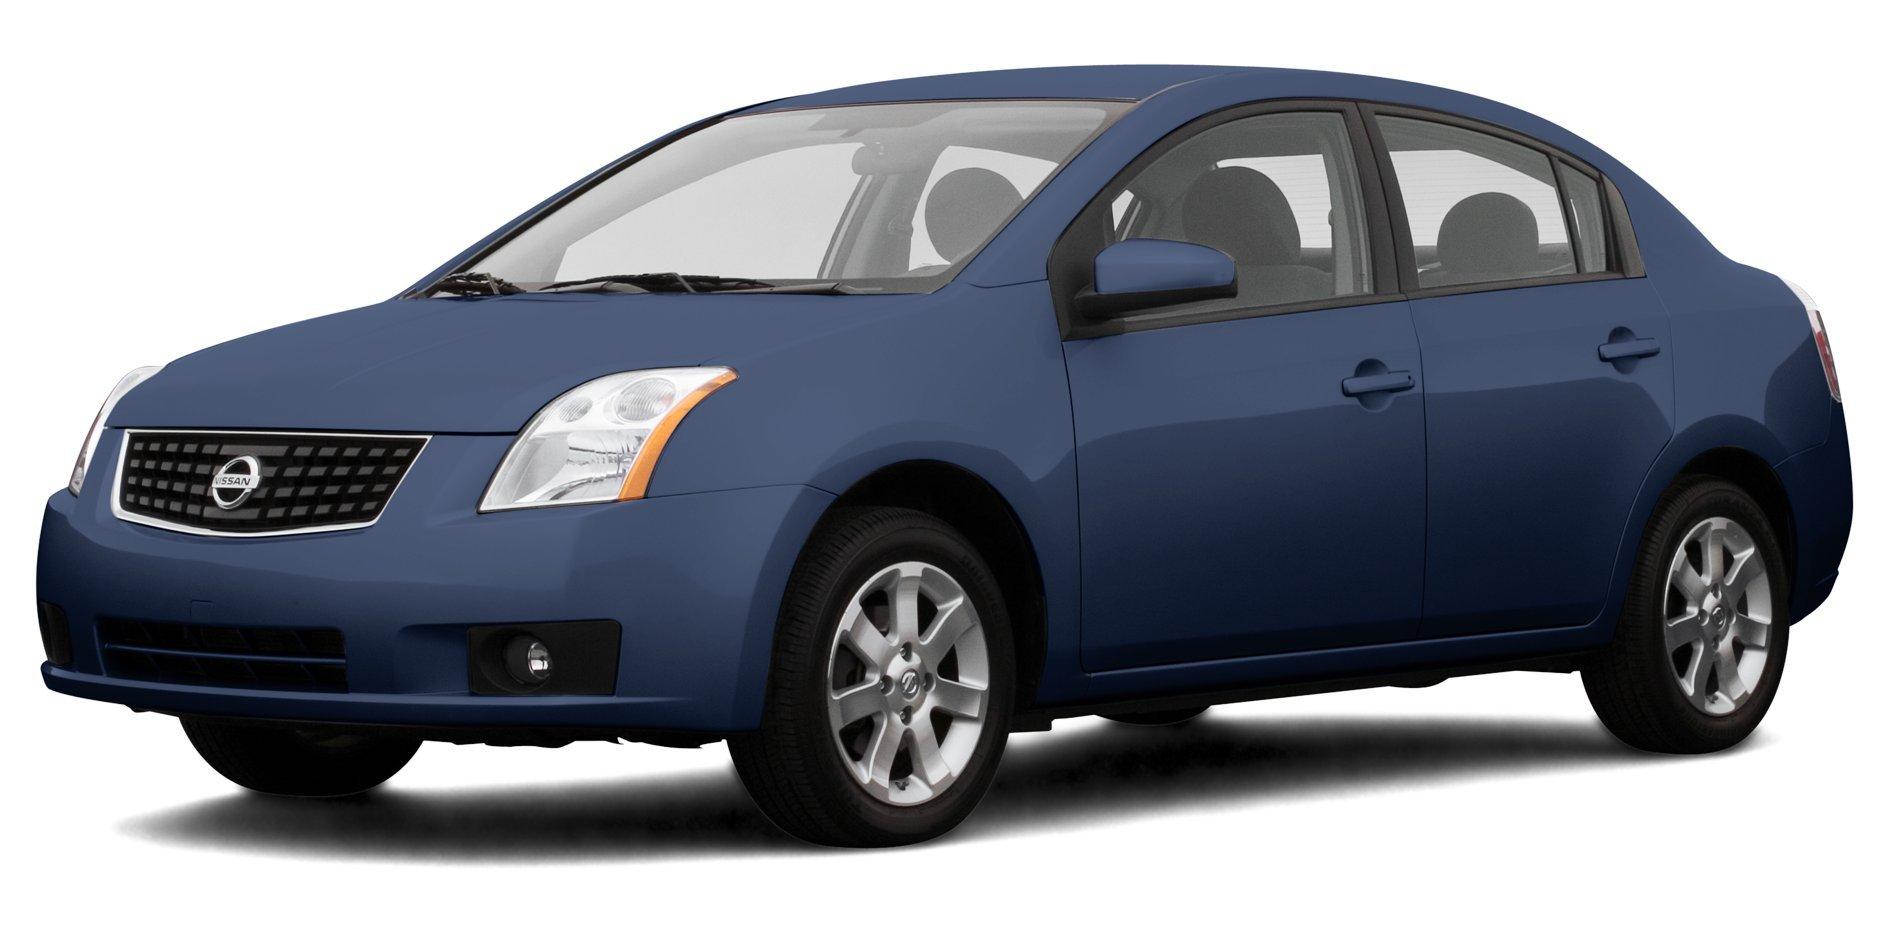 ... 2007 Nissan Sentra SE-R, 4-Door Sedan 4-Cylinder CVT